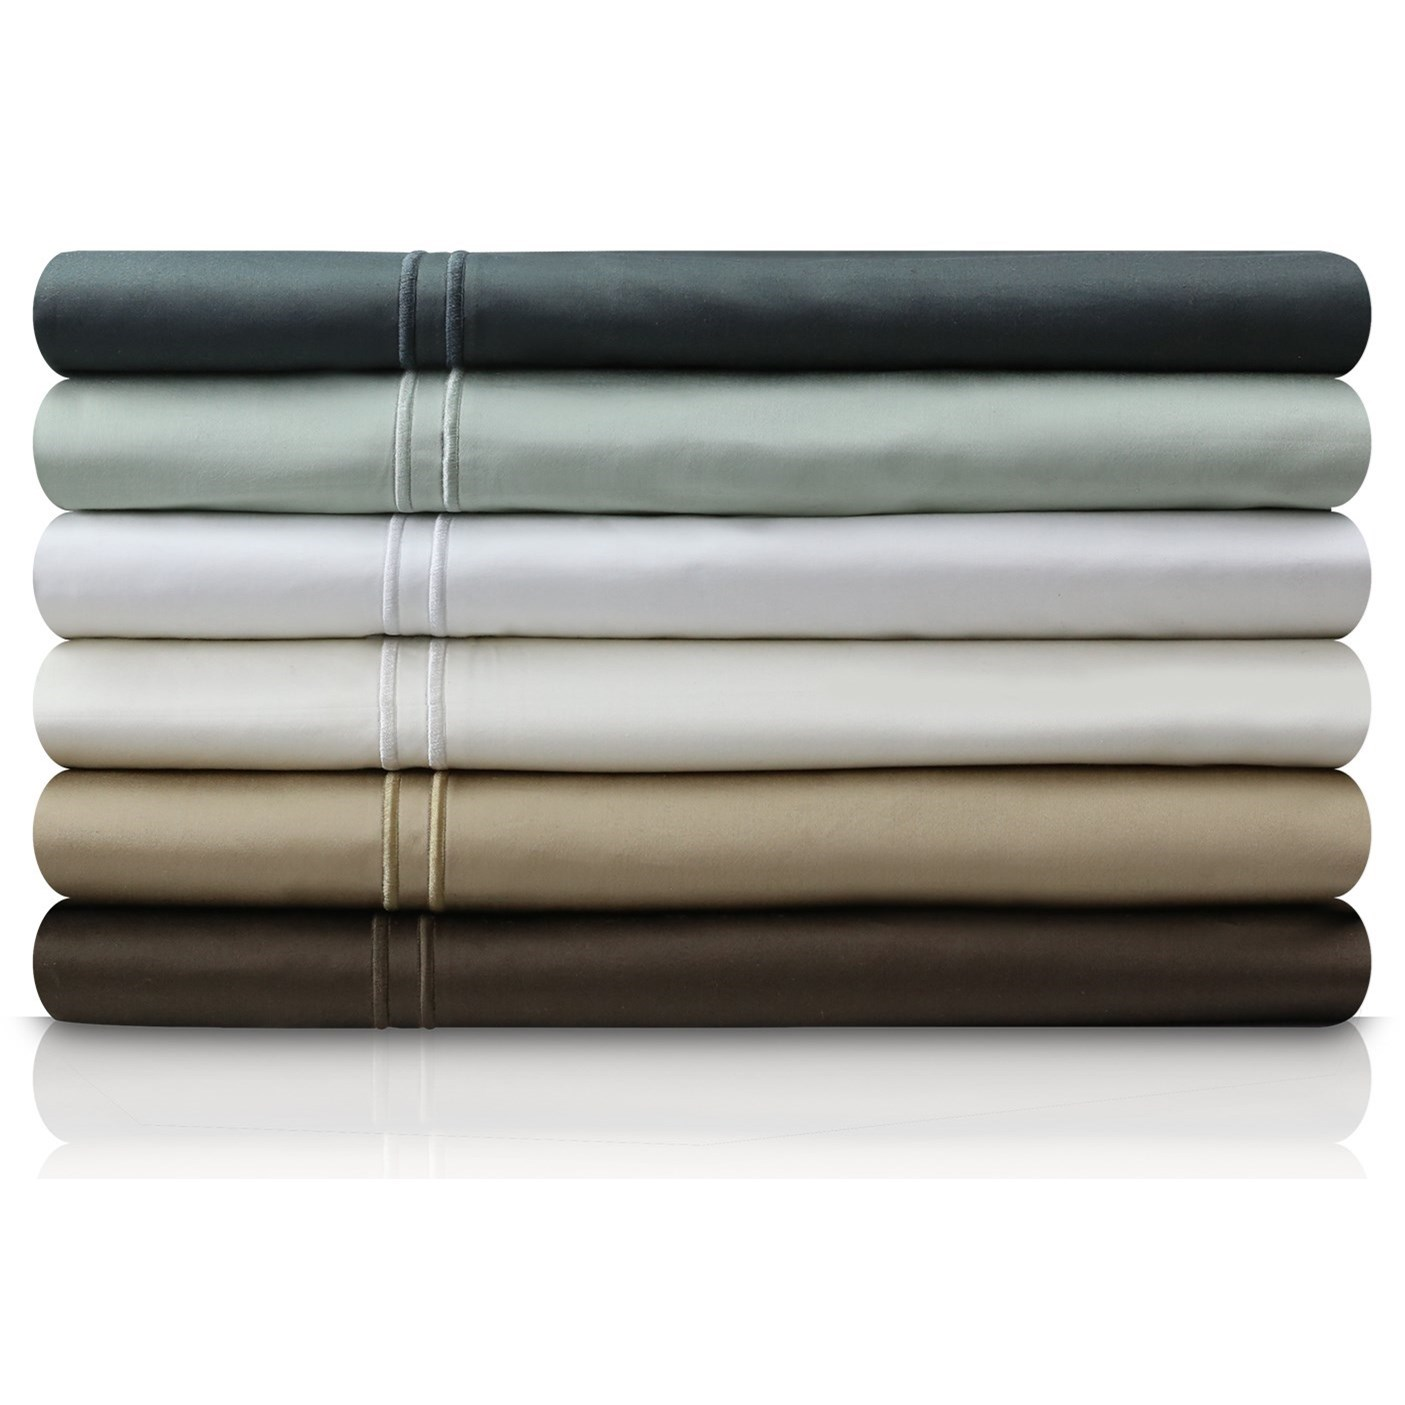 Malouf Egyptian Cotton Queen 600 TC Egyptian Cotton Sheet Set - Item Number: MA06QQWHSS